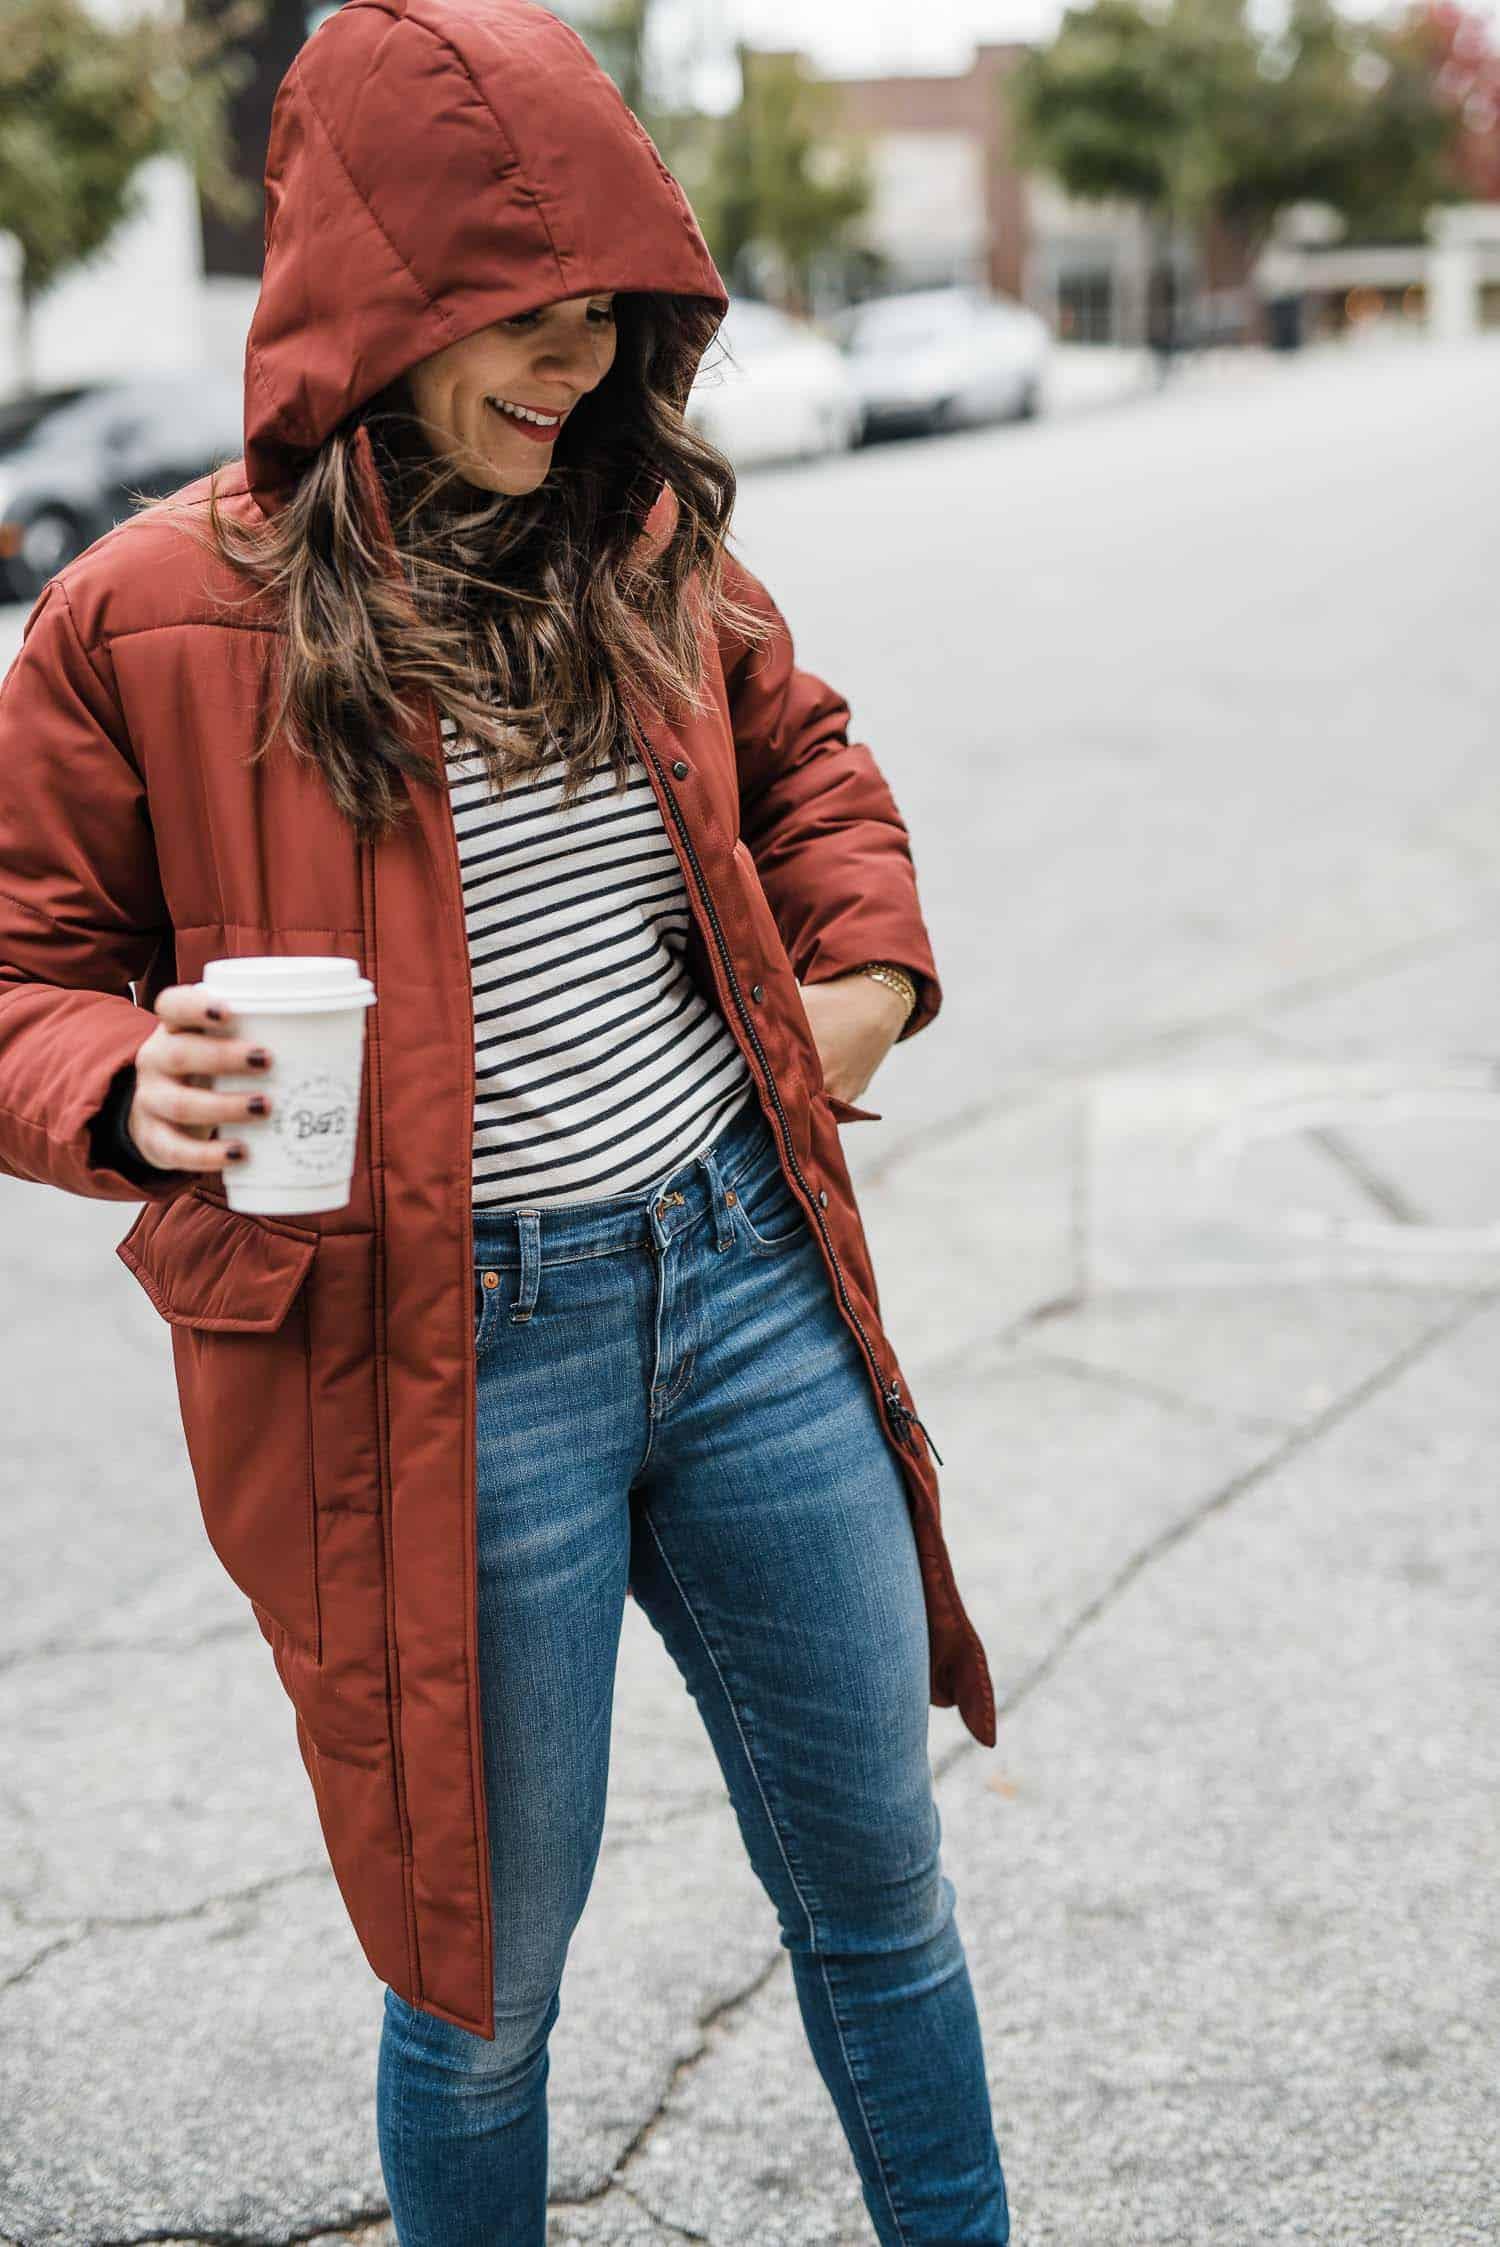 Everlane Review - My Style Vita